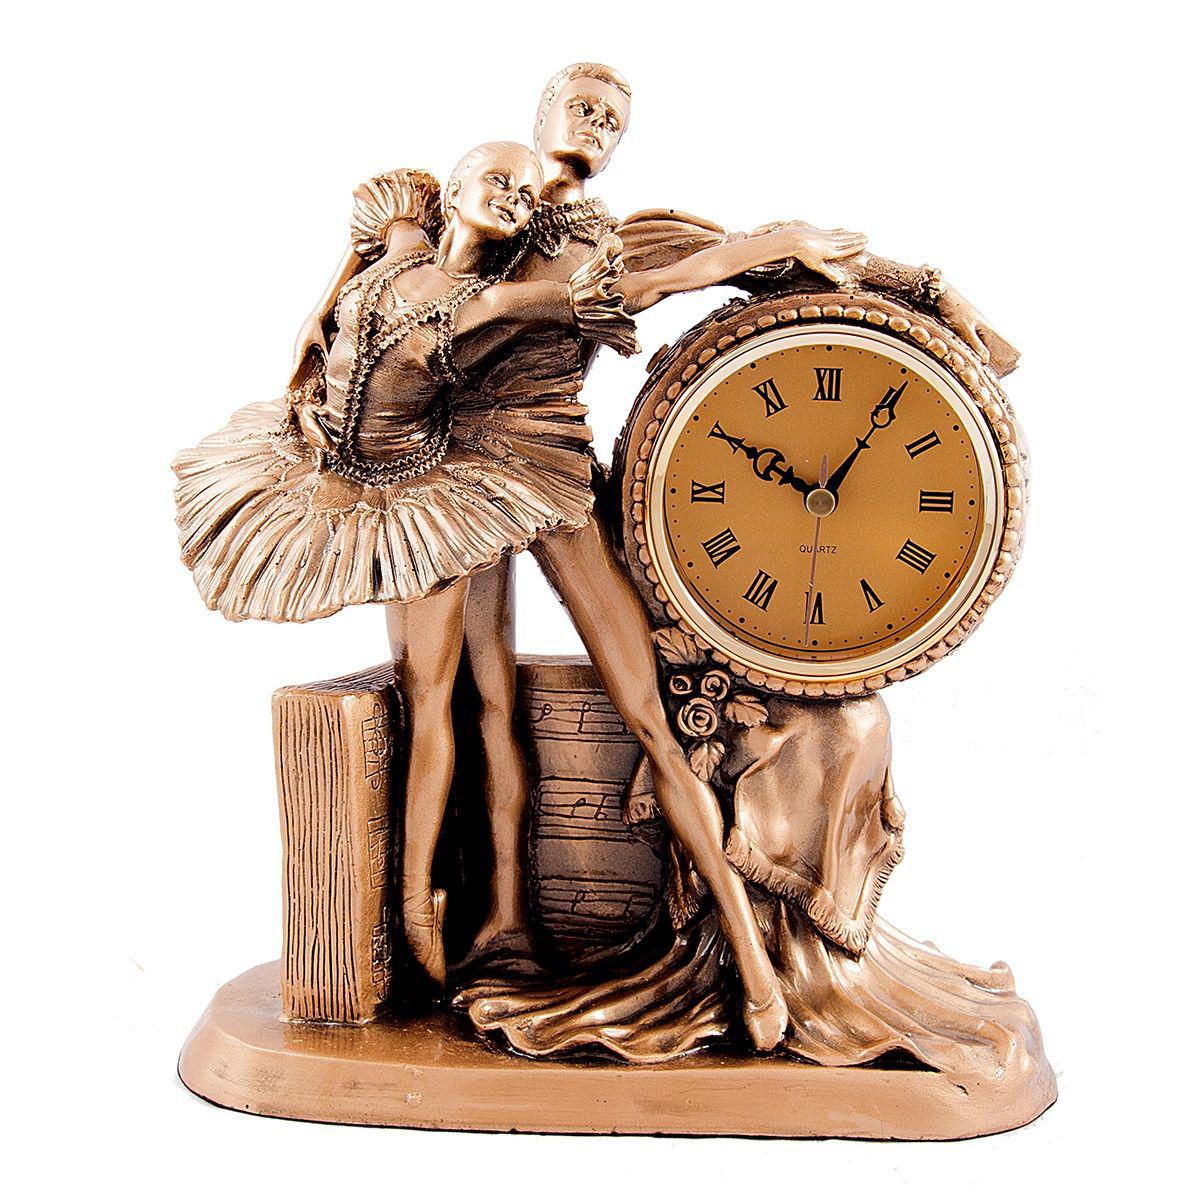 Часы настольные Русские Подарки Балет, 23 х 12 х 26 см. 5937359373